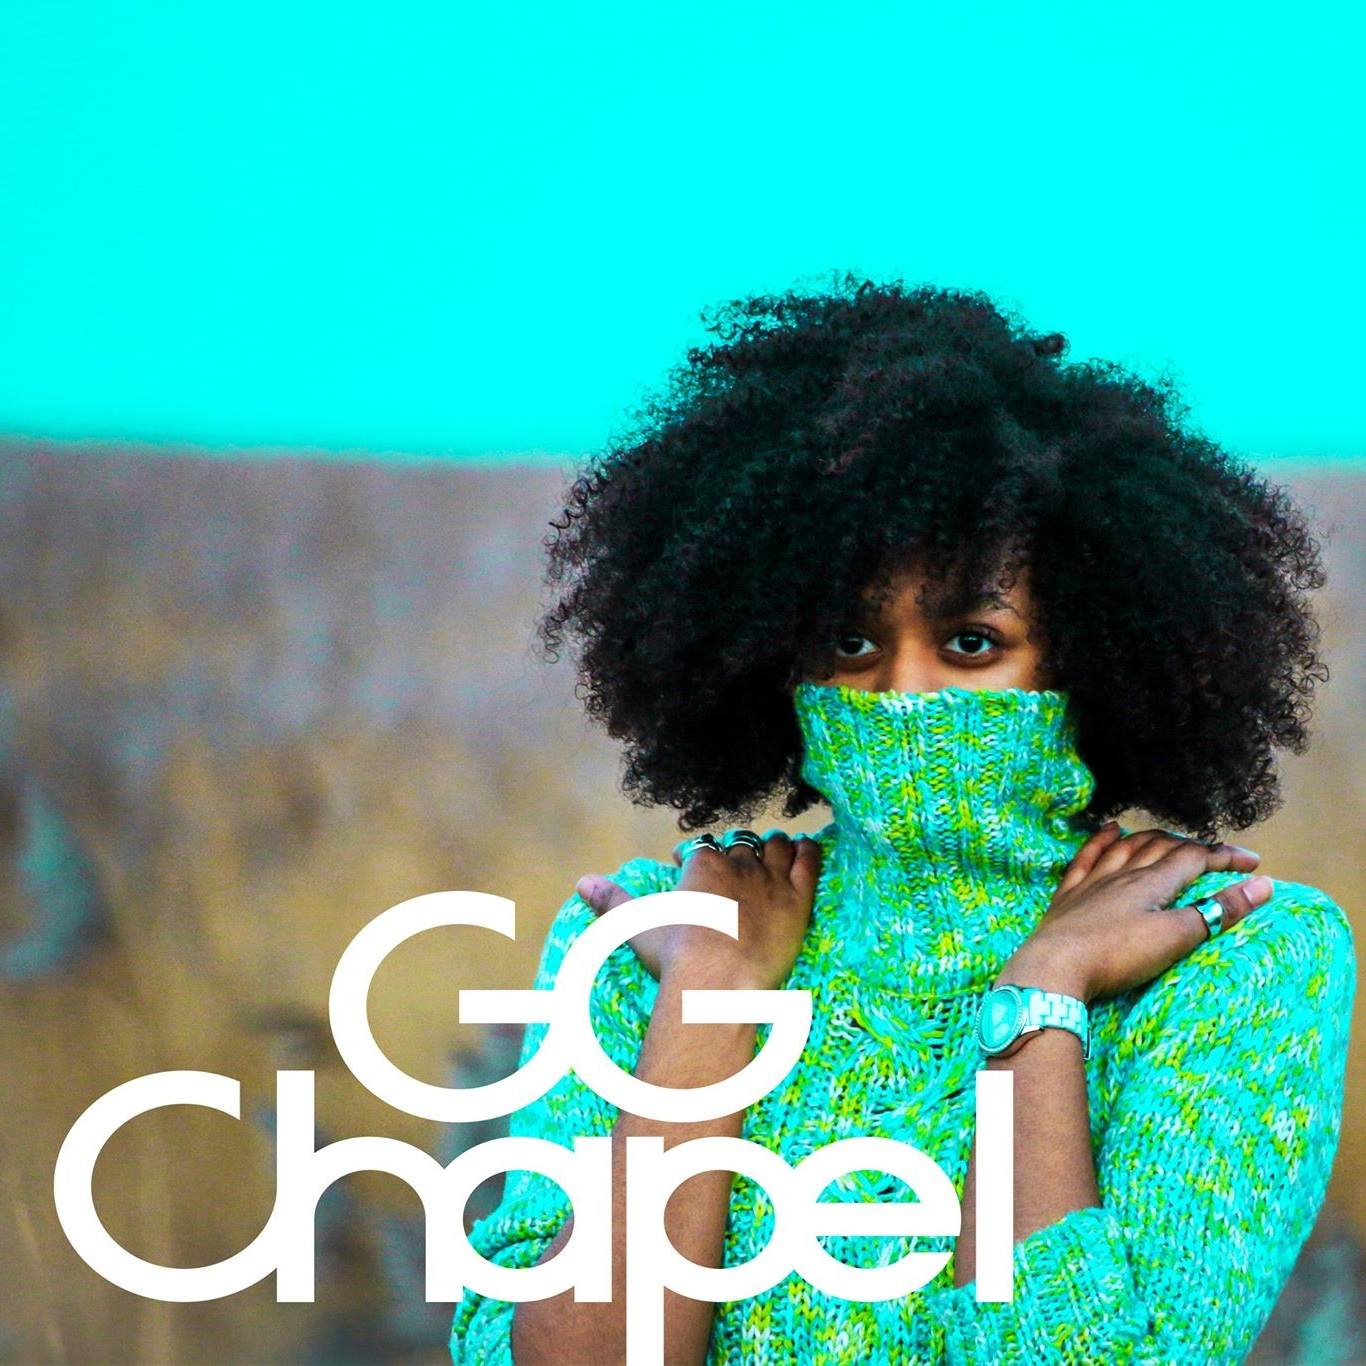 GG Chapel